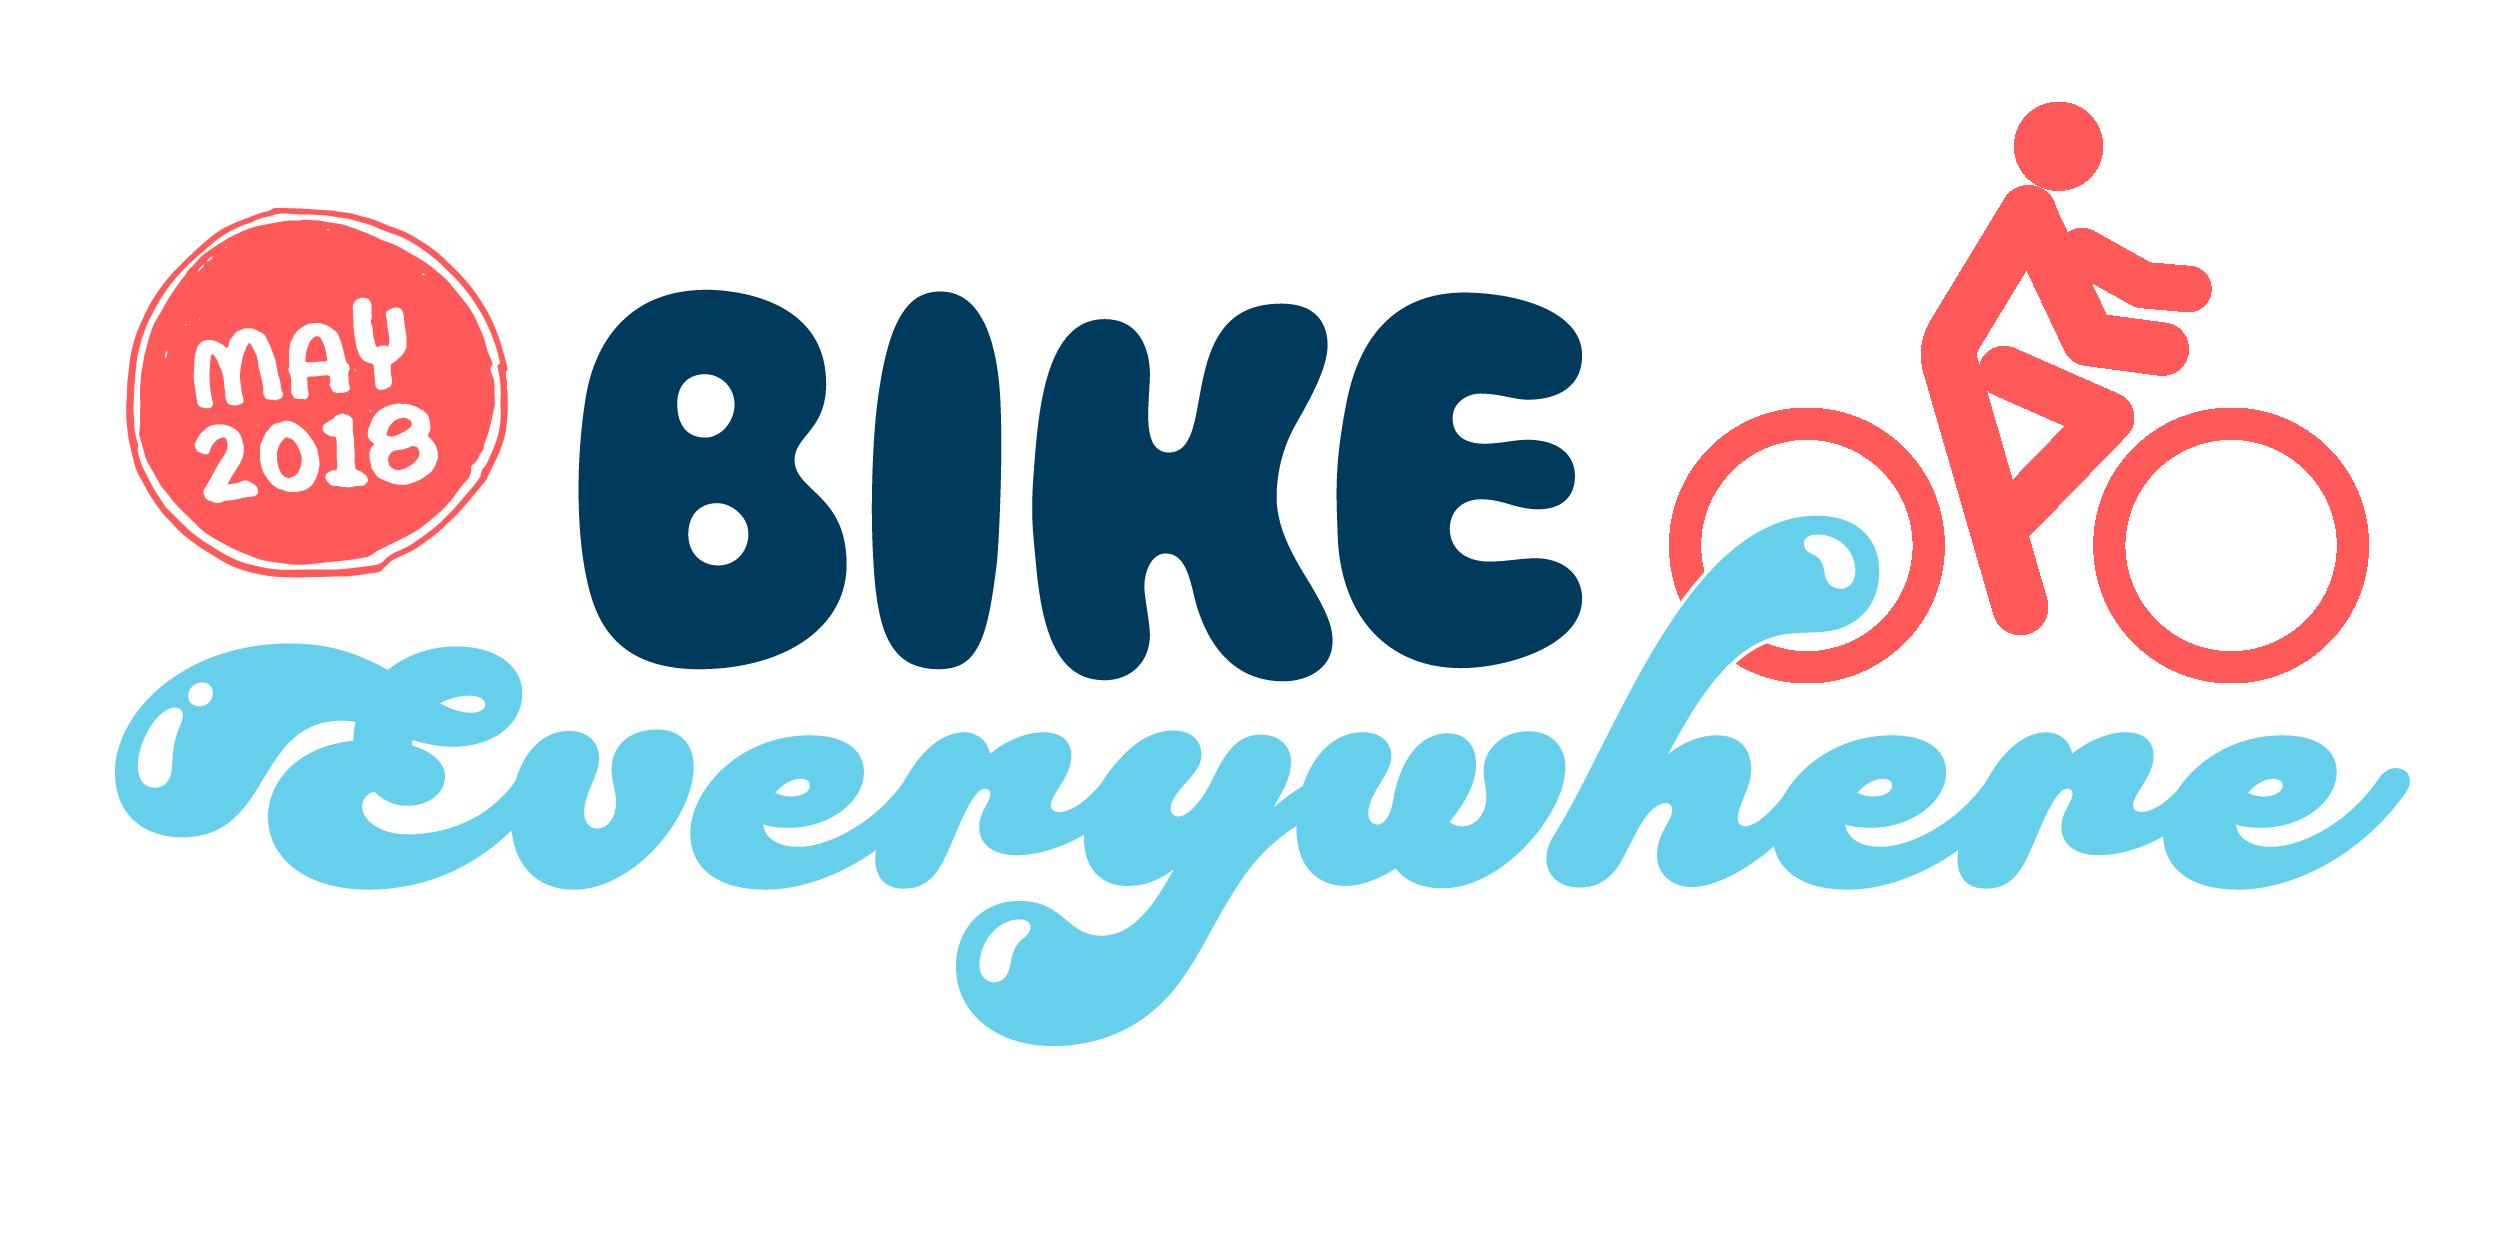 Schedule clipart calendar day. Bike everywhere month cascade